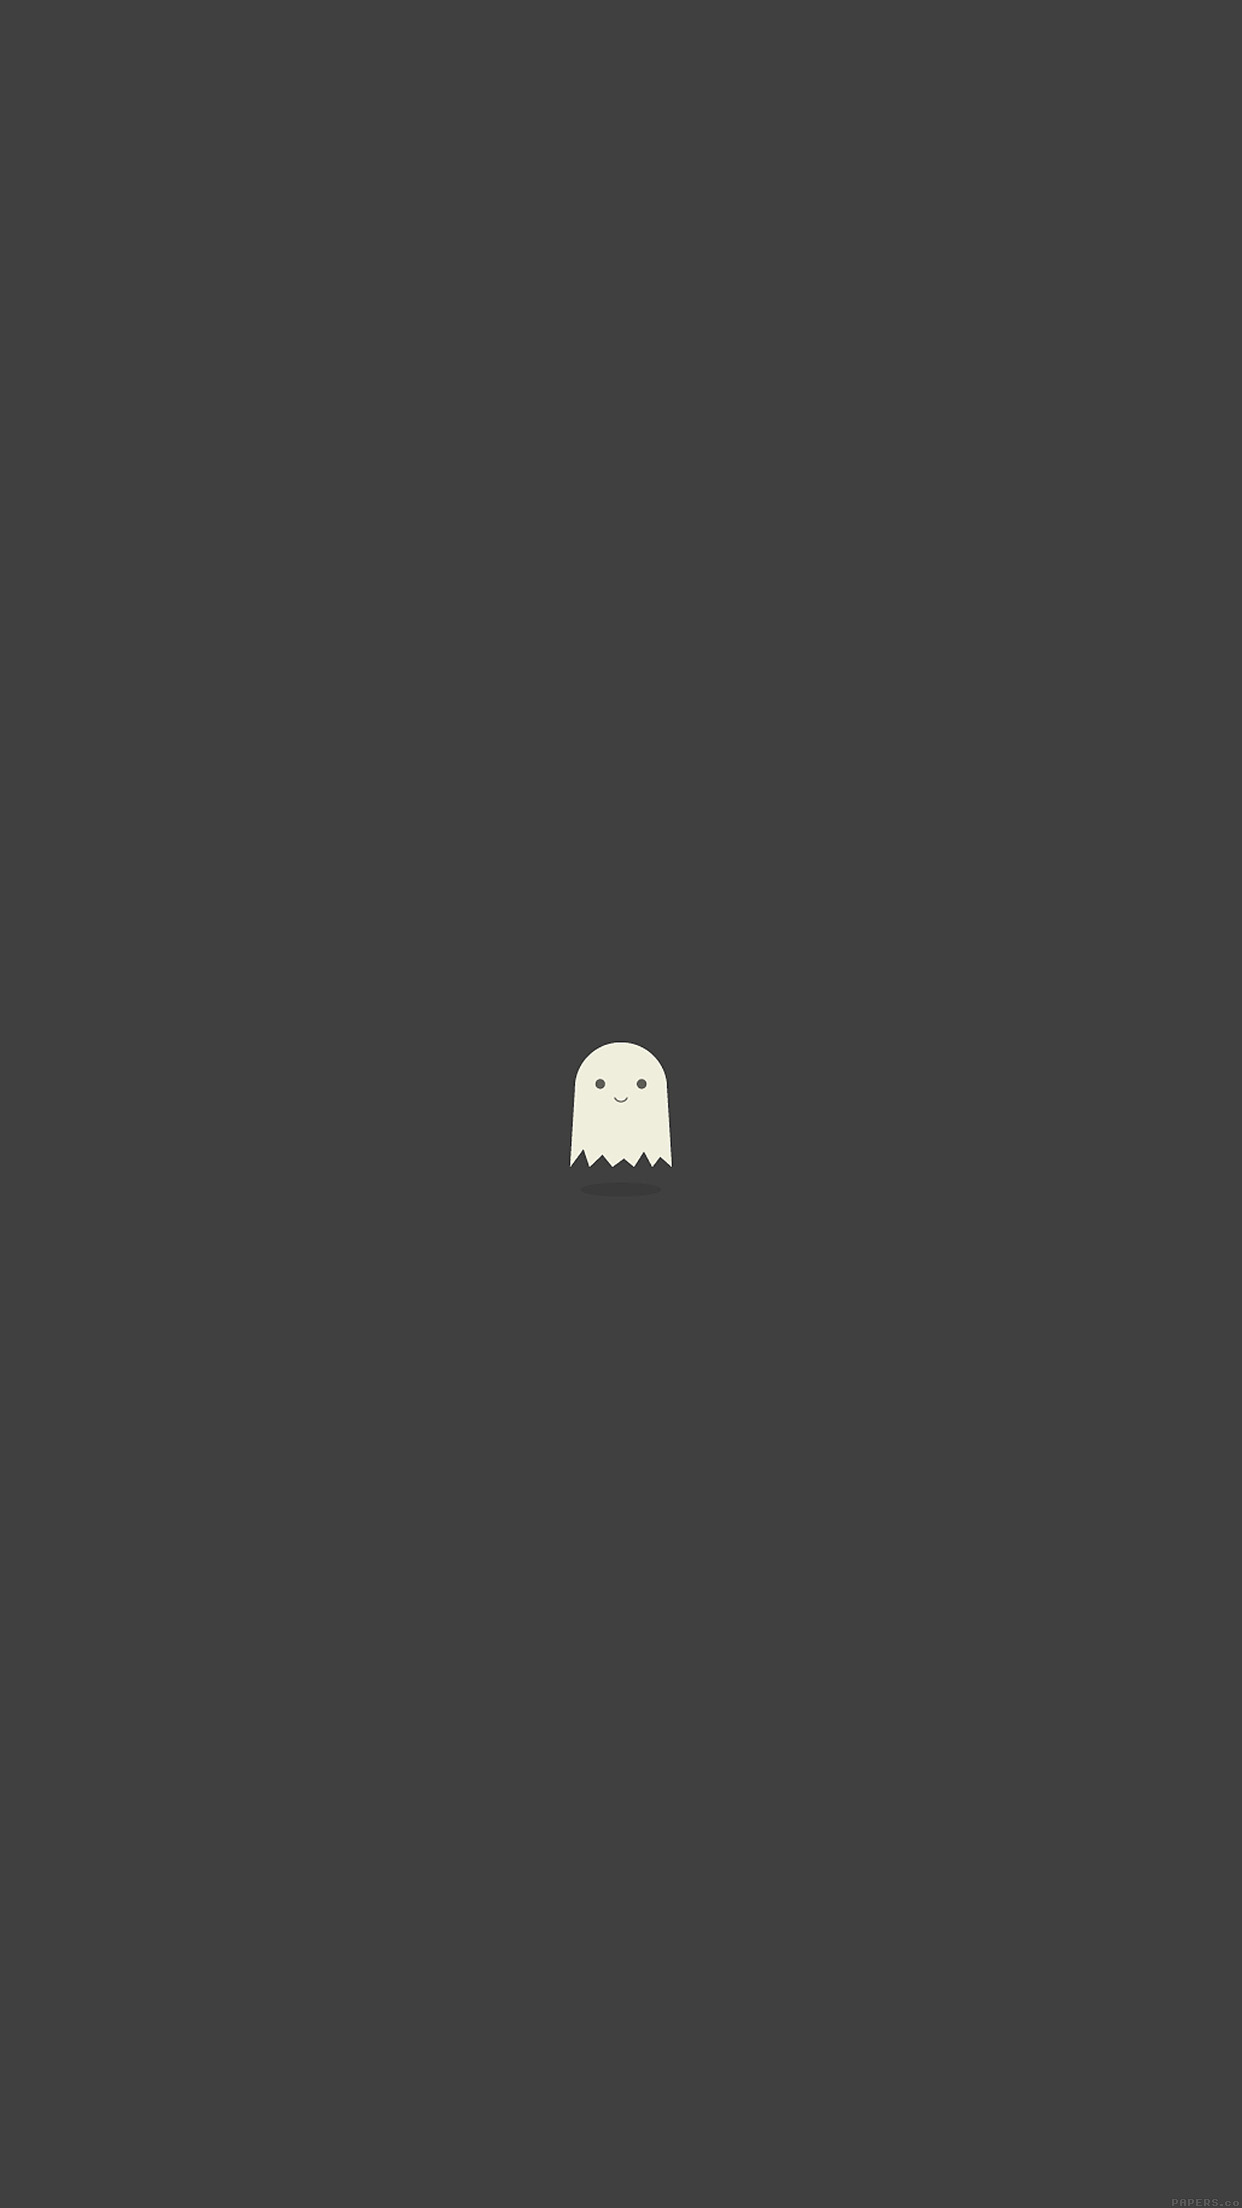 I love papers ah62 cute ghost art illust minimal simple iphone 6 download ipad wallpapers voltagebd Images